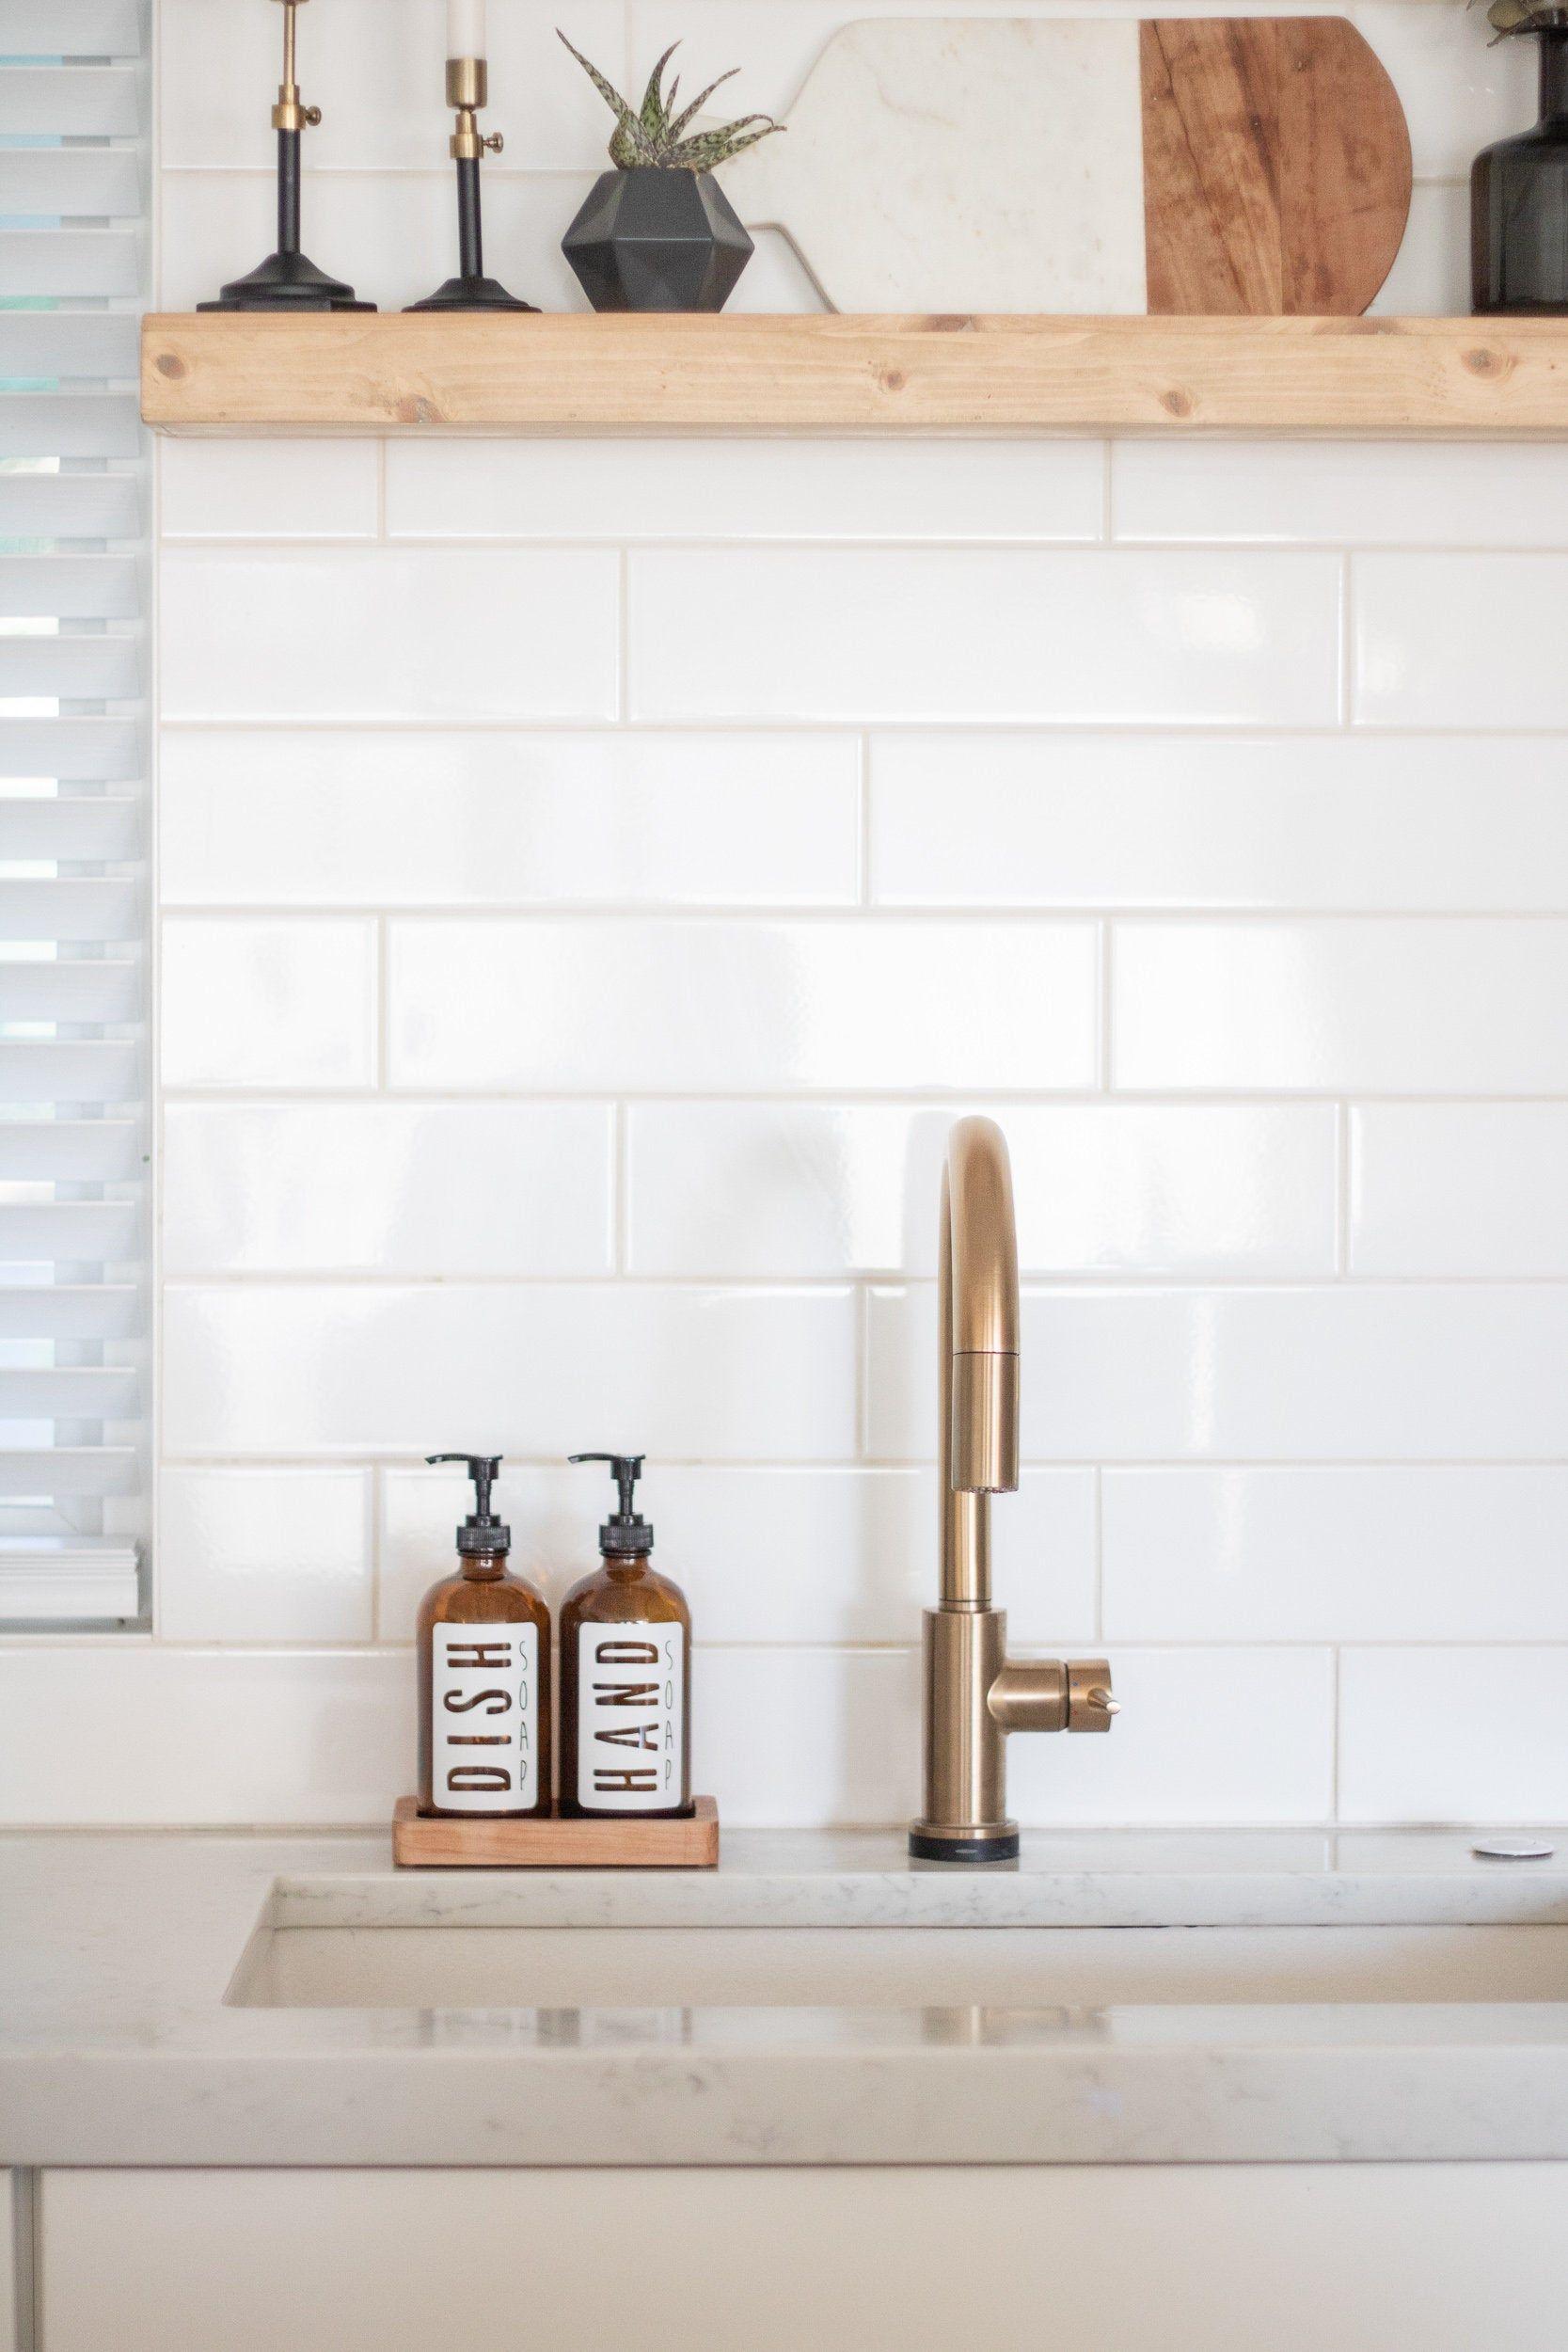 Amber Glass Hand And Dish Soap Dispenser Set Kitchen Soap Dispenser Dish Soap Dispenser Countertop Decor